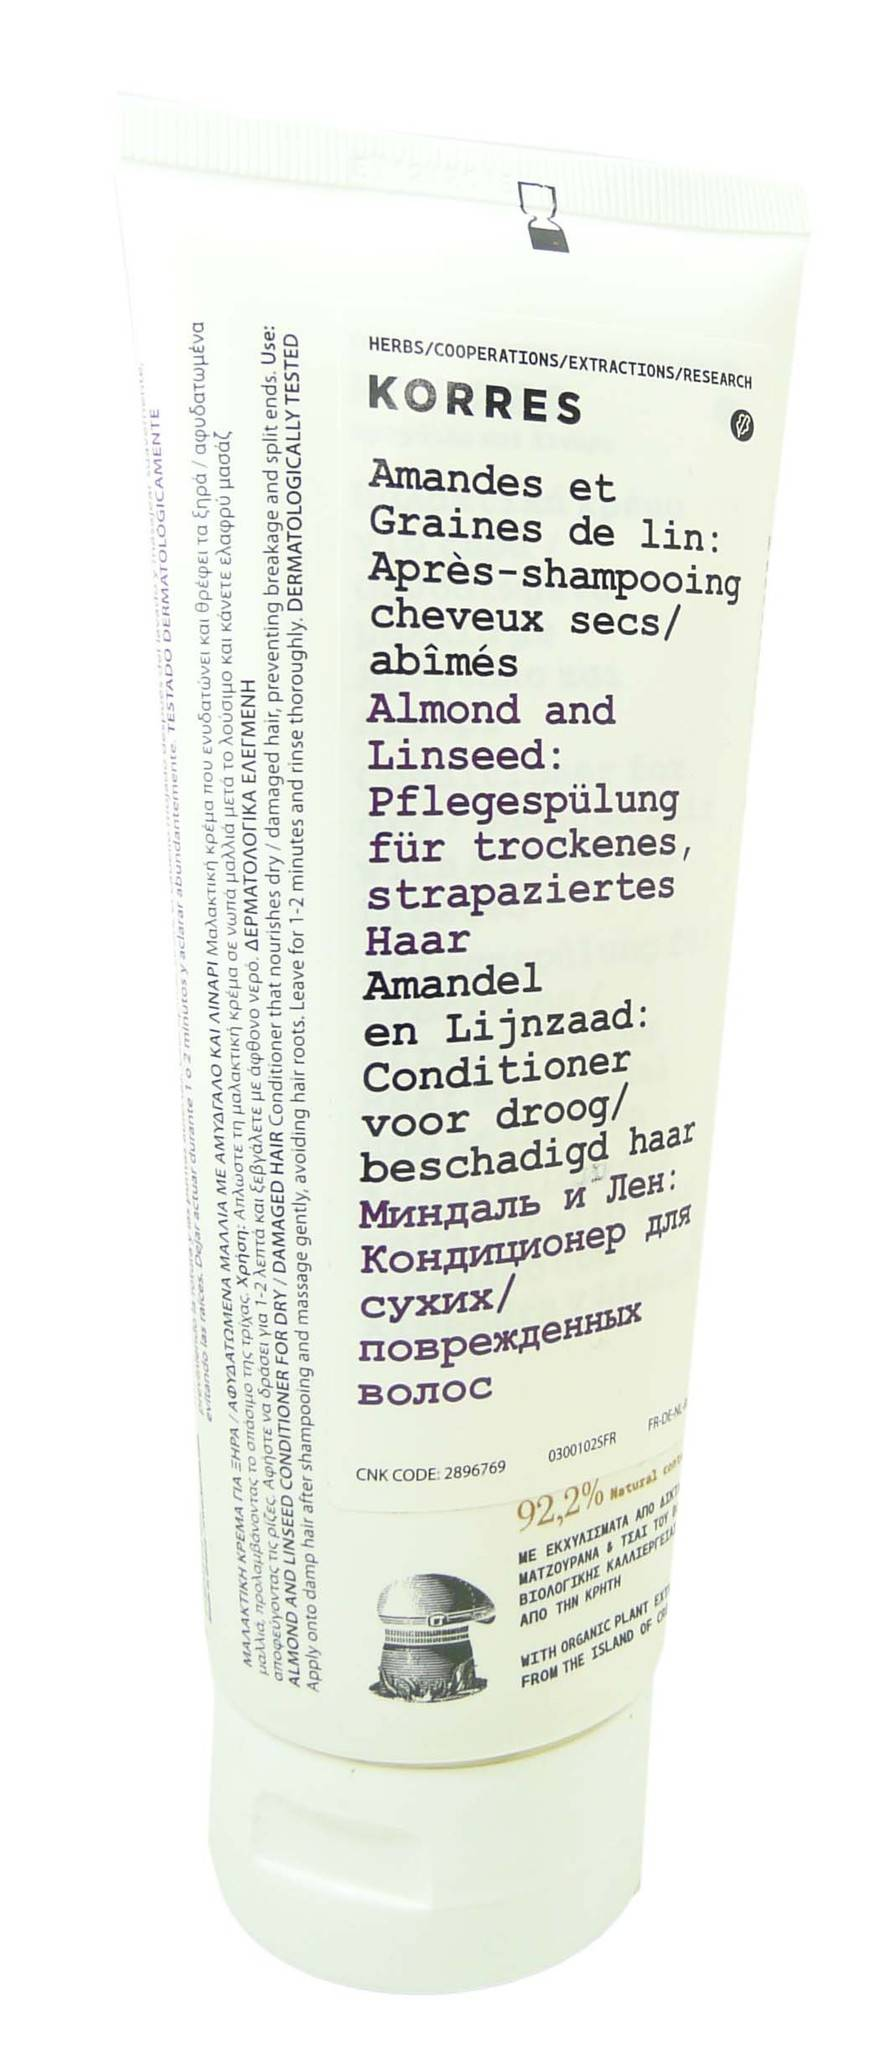 Korres apres shampooing amandes &graines de lin 200ml